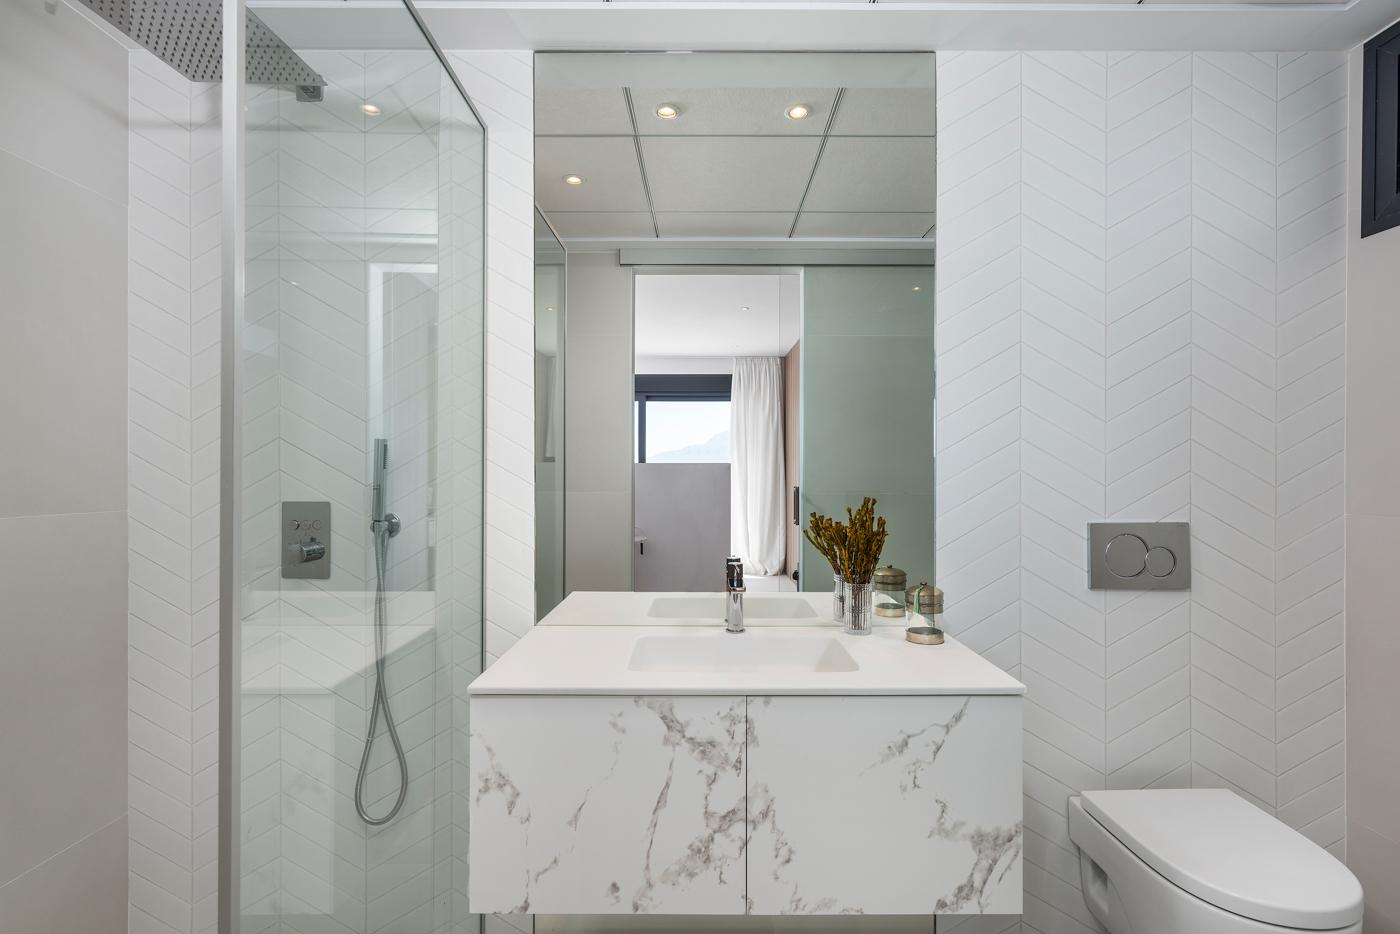 47 - Venecia III - 3rd Bedroom suite Bathroom 1